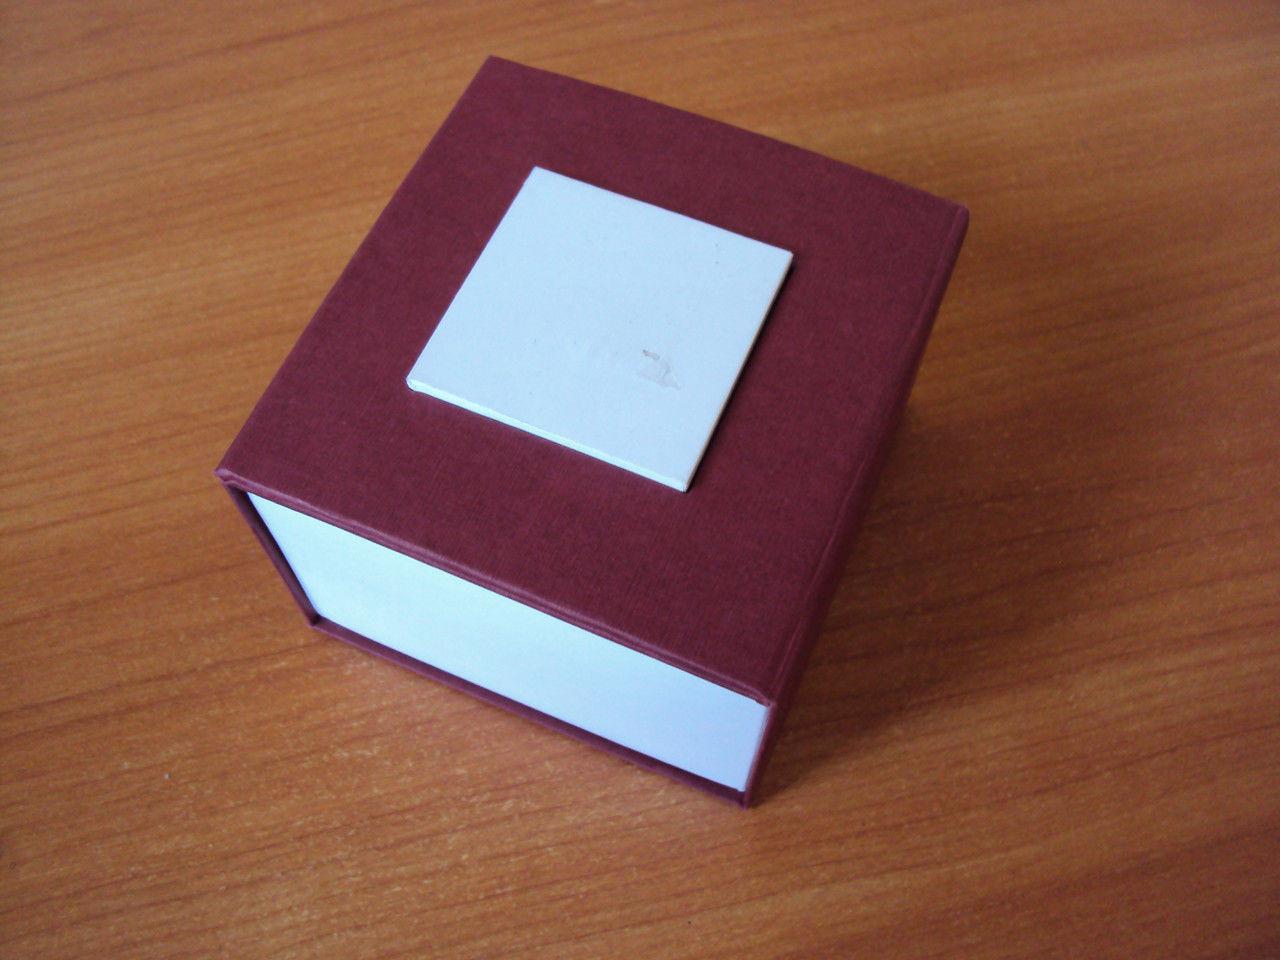 Бордовая подарочная коробка для часов, футляр, шкатулка ( код: IBW028KO )